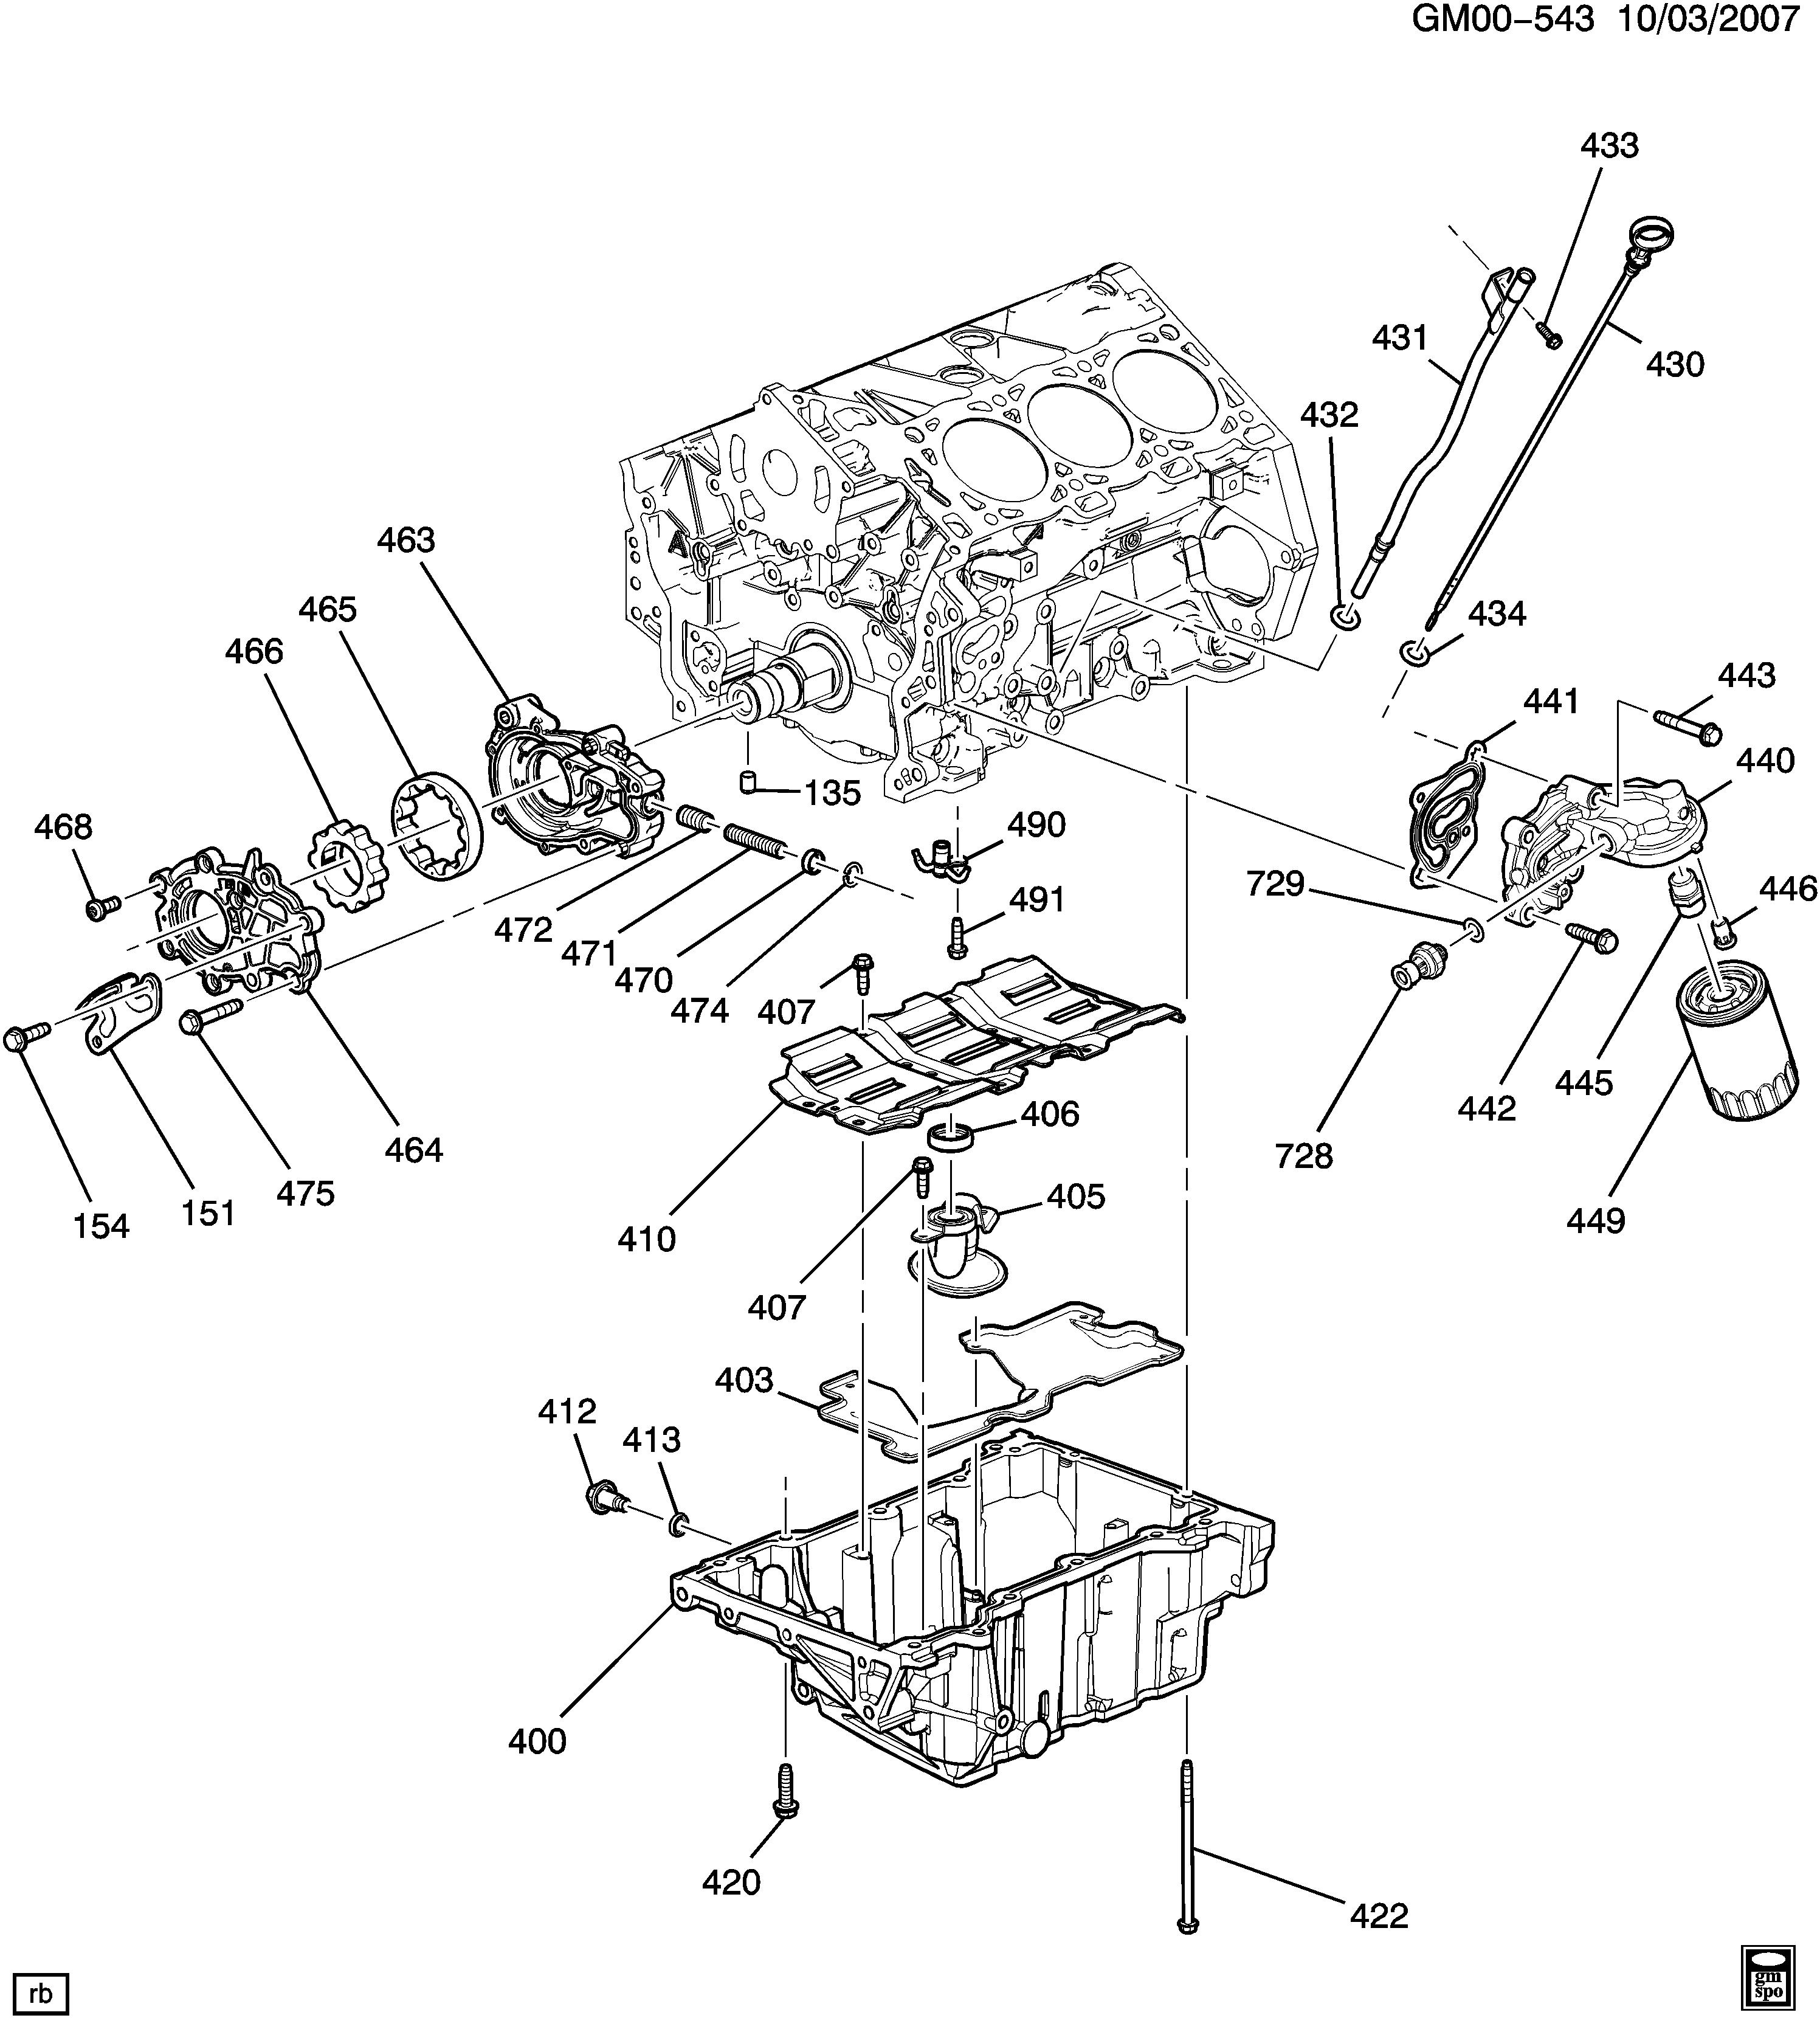 Buick Rendezvous - B ENGINE ASM-3 6L V6 PART 4 OIL PUMP,OIL